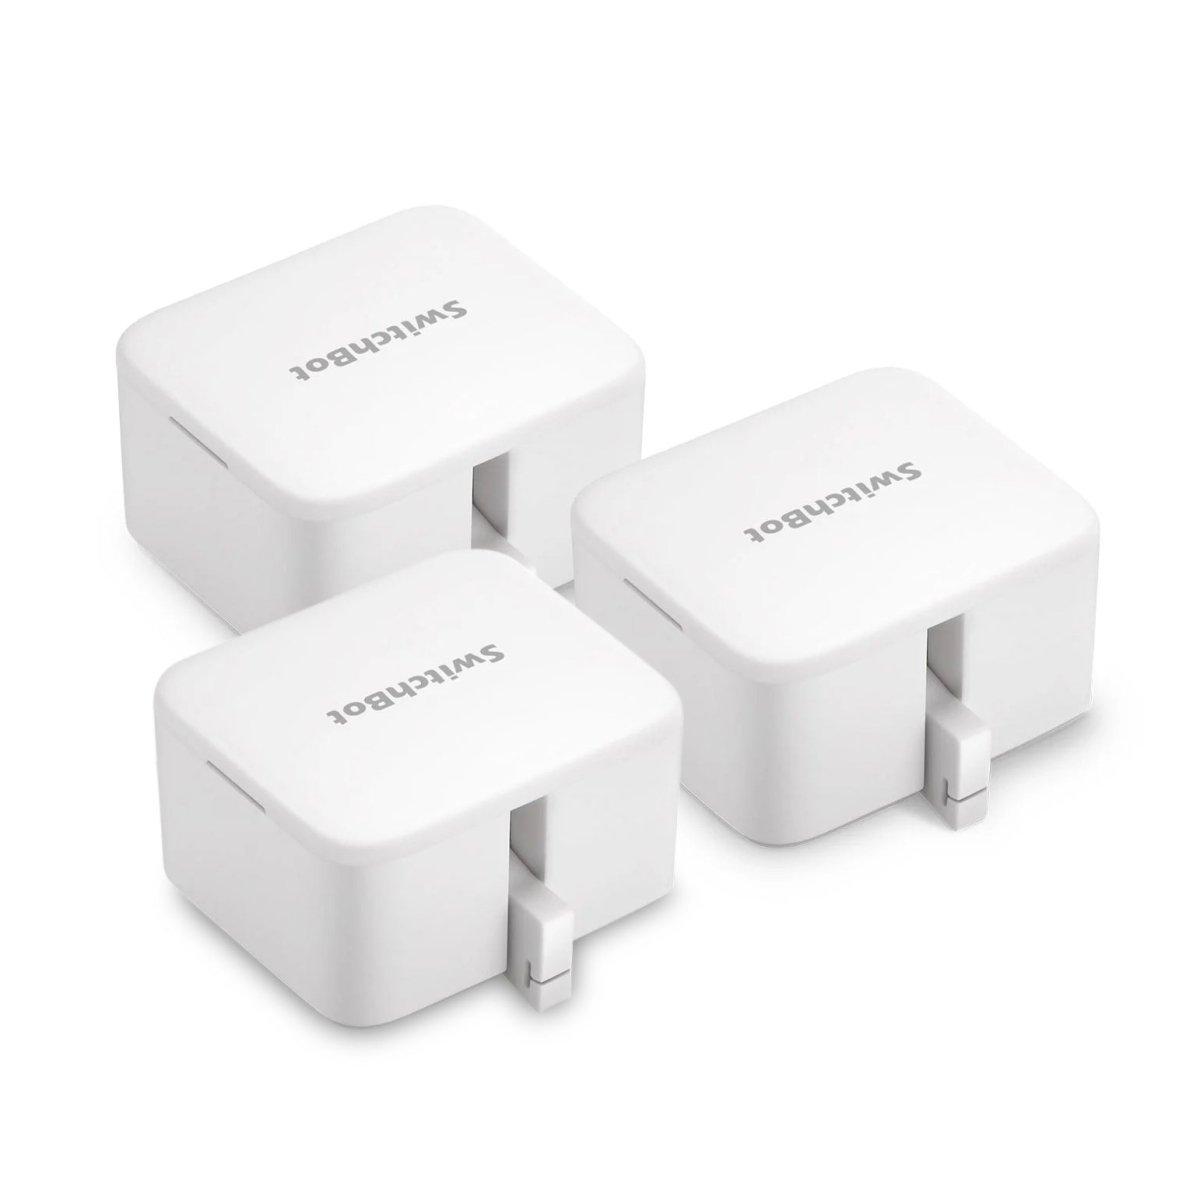 Switch Bot スイッチボット(ホワイト)3個セット